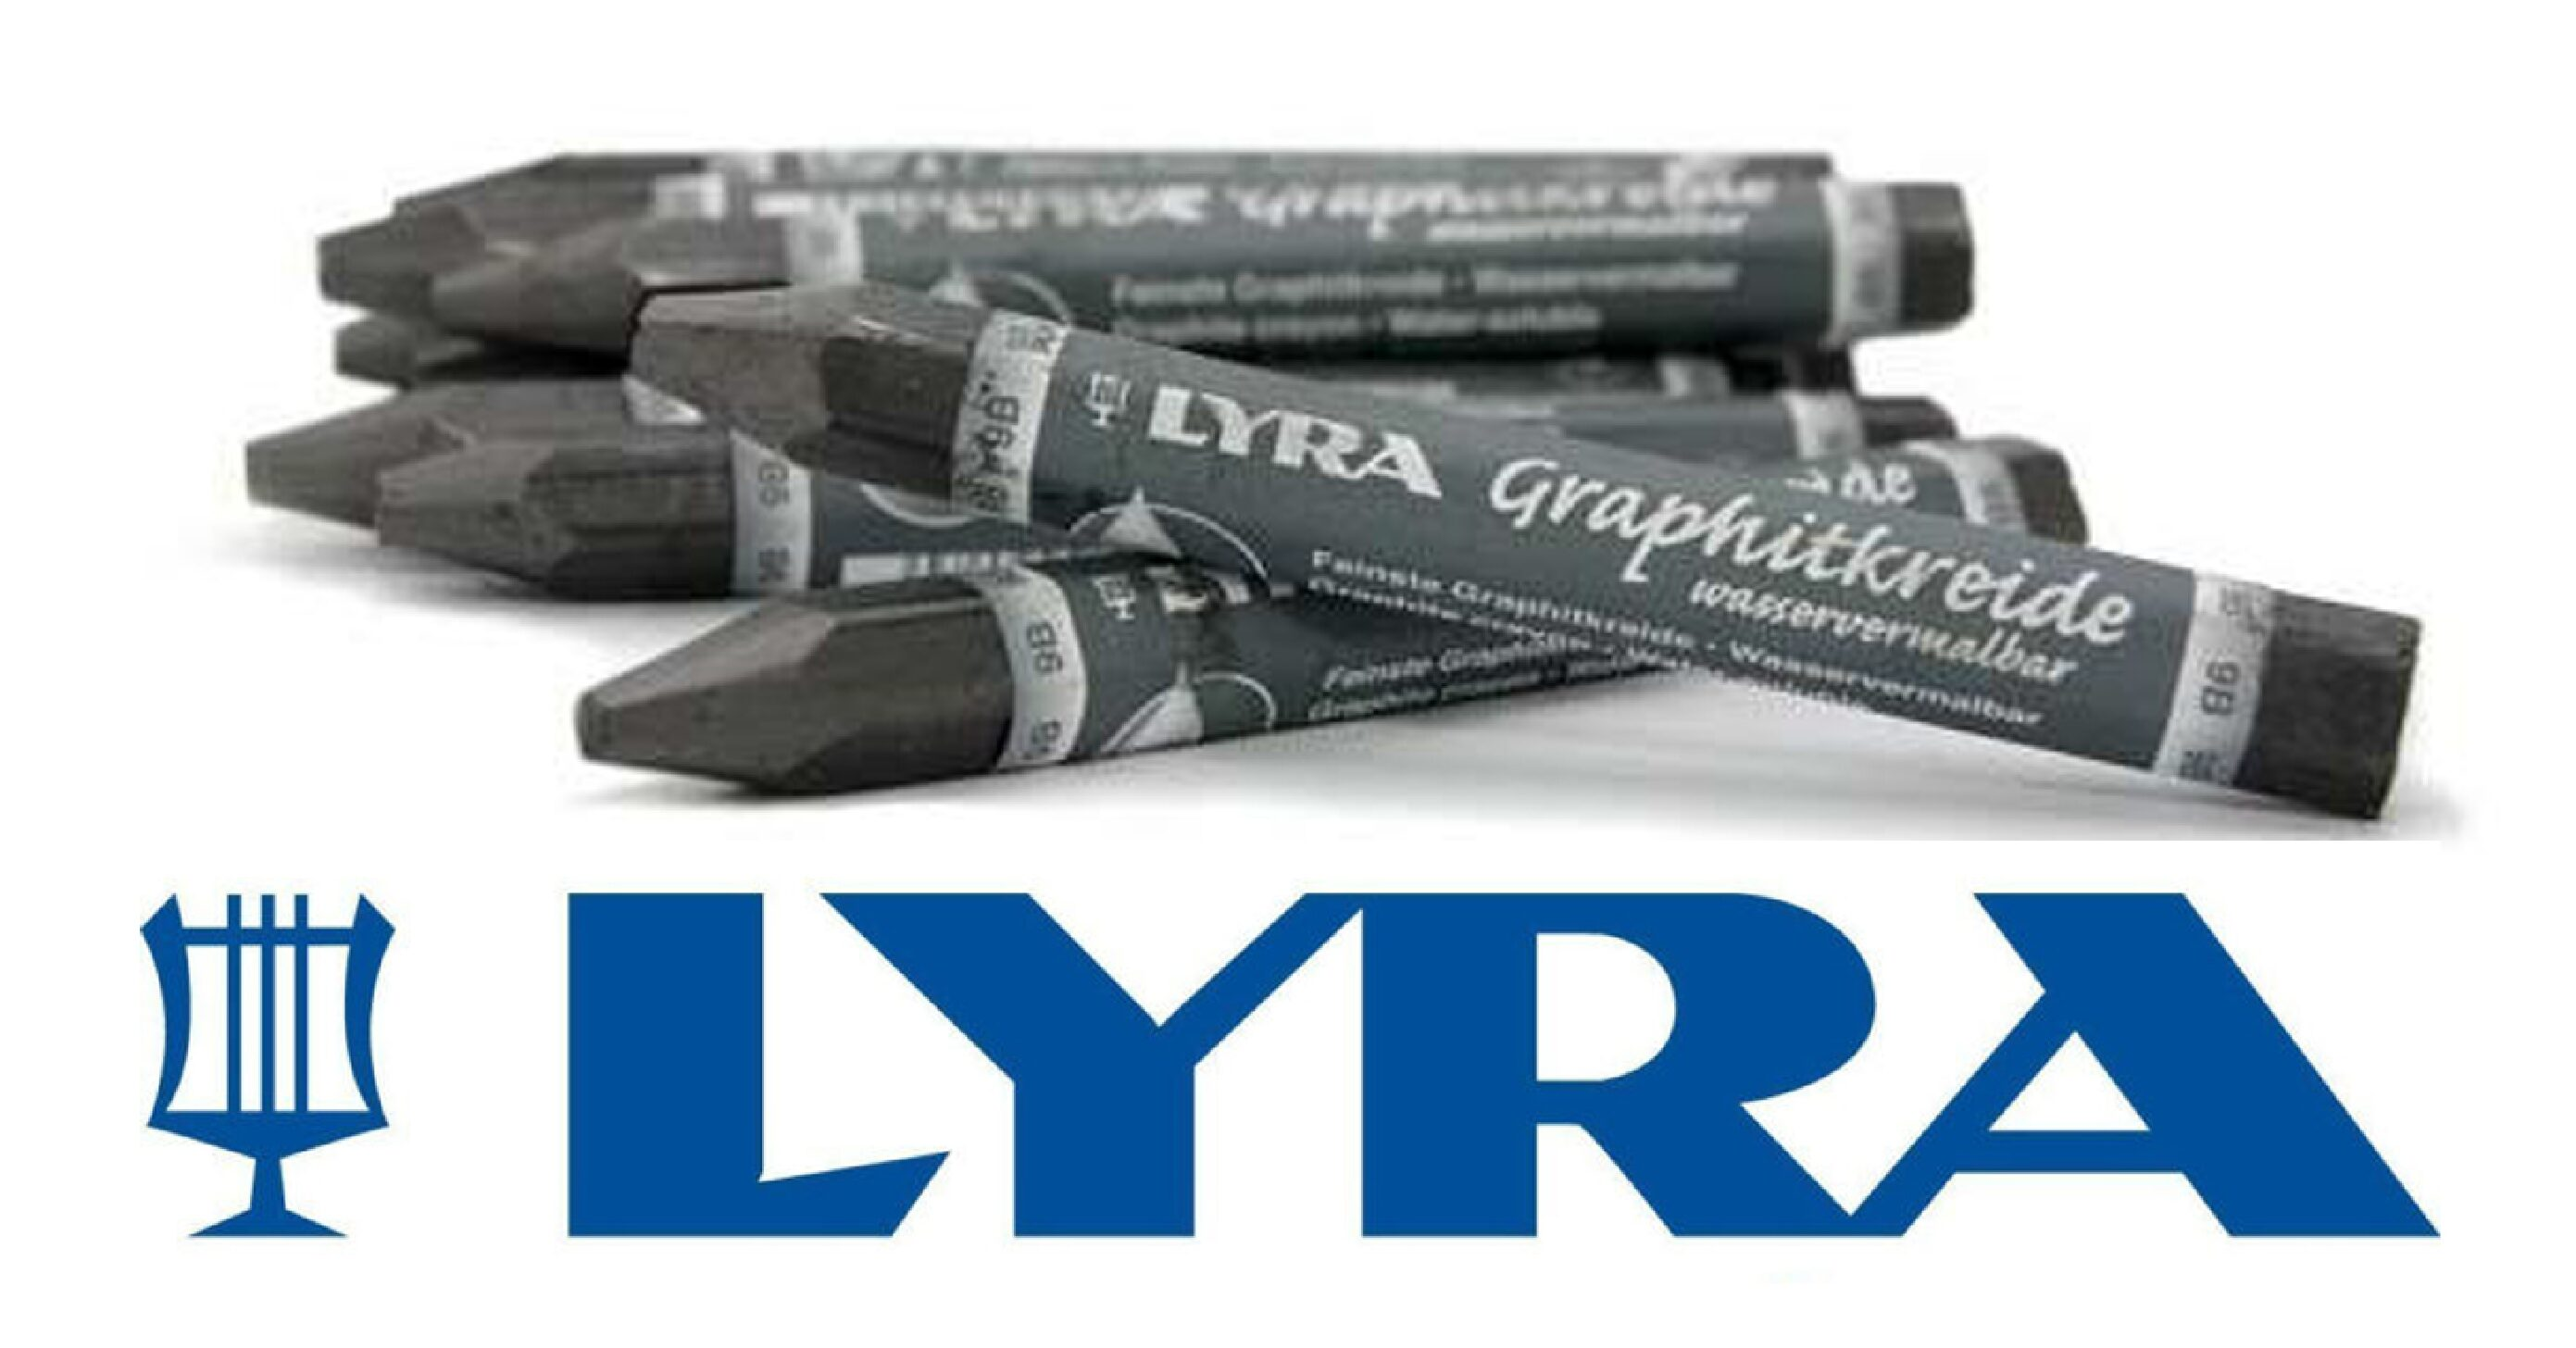 LYRA™ Graphite Crayons